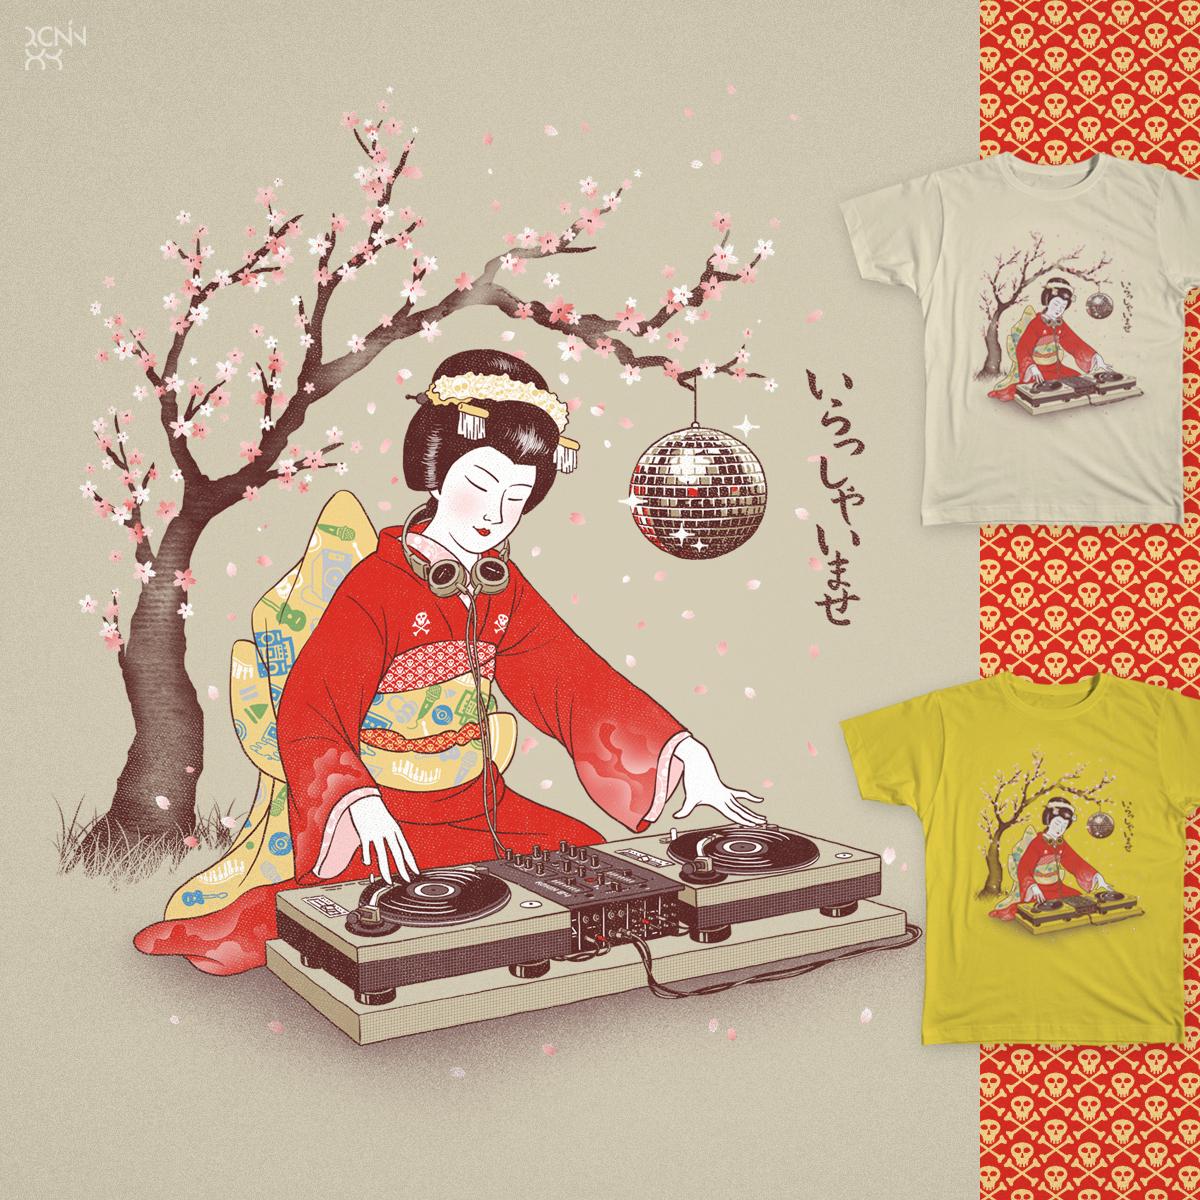 DJ Geiko by ronin84 on Threadless